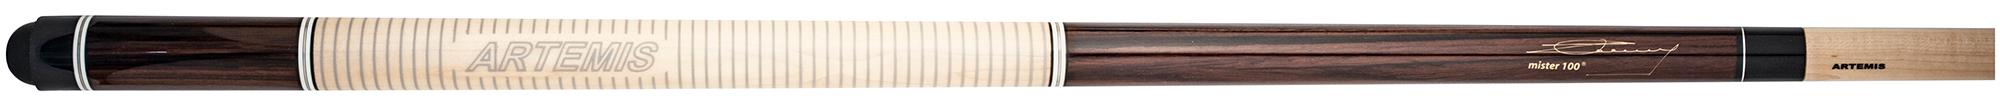 CK0200-07: Artemis Mister 100 Rosewood 3D grip #1